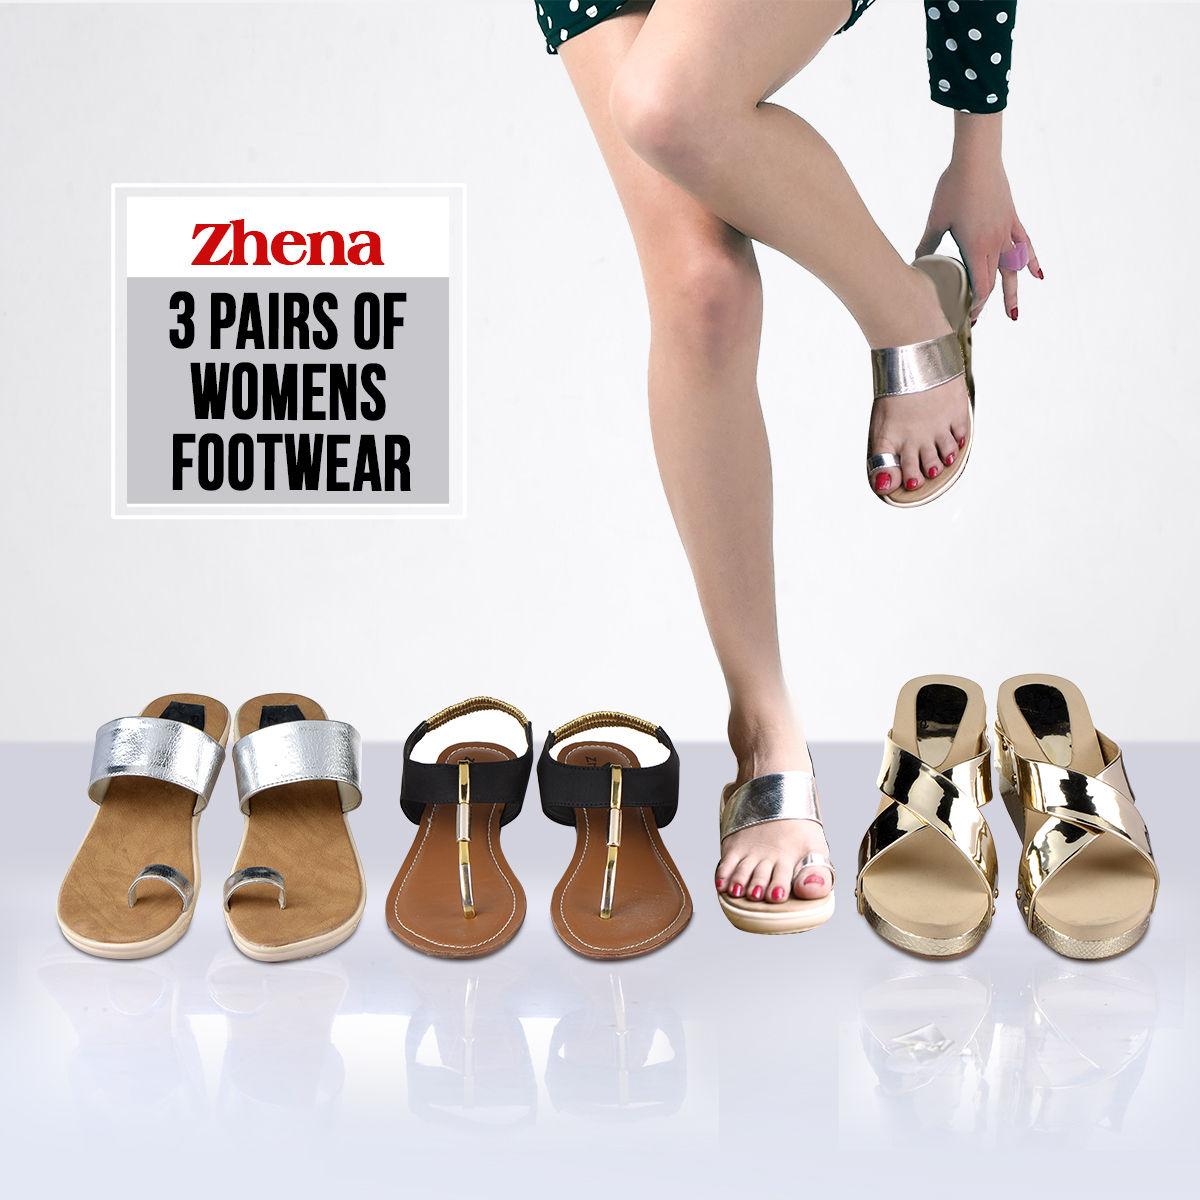 71d7f0d719d Zhena 3 Pairs of Women's Footwear